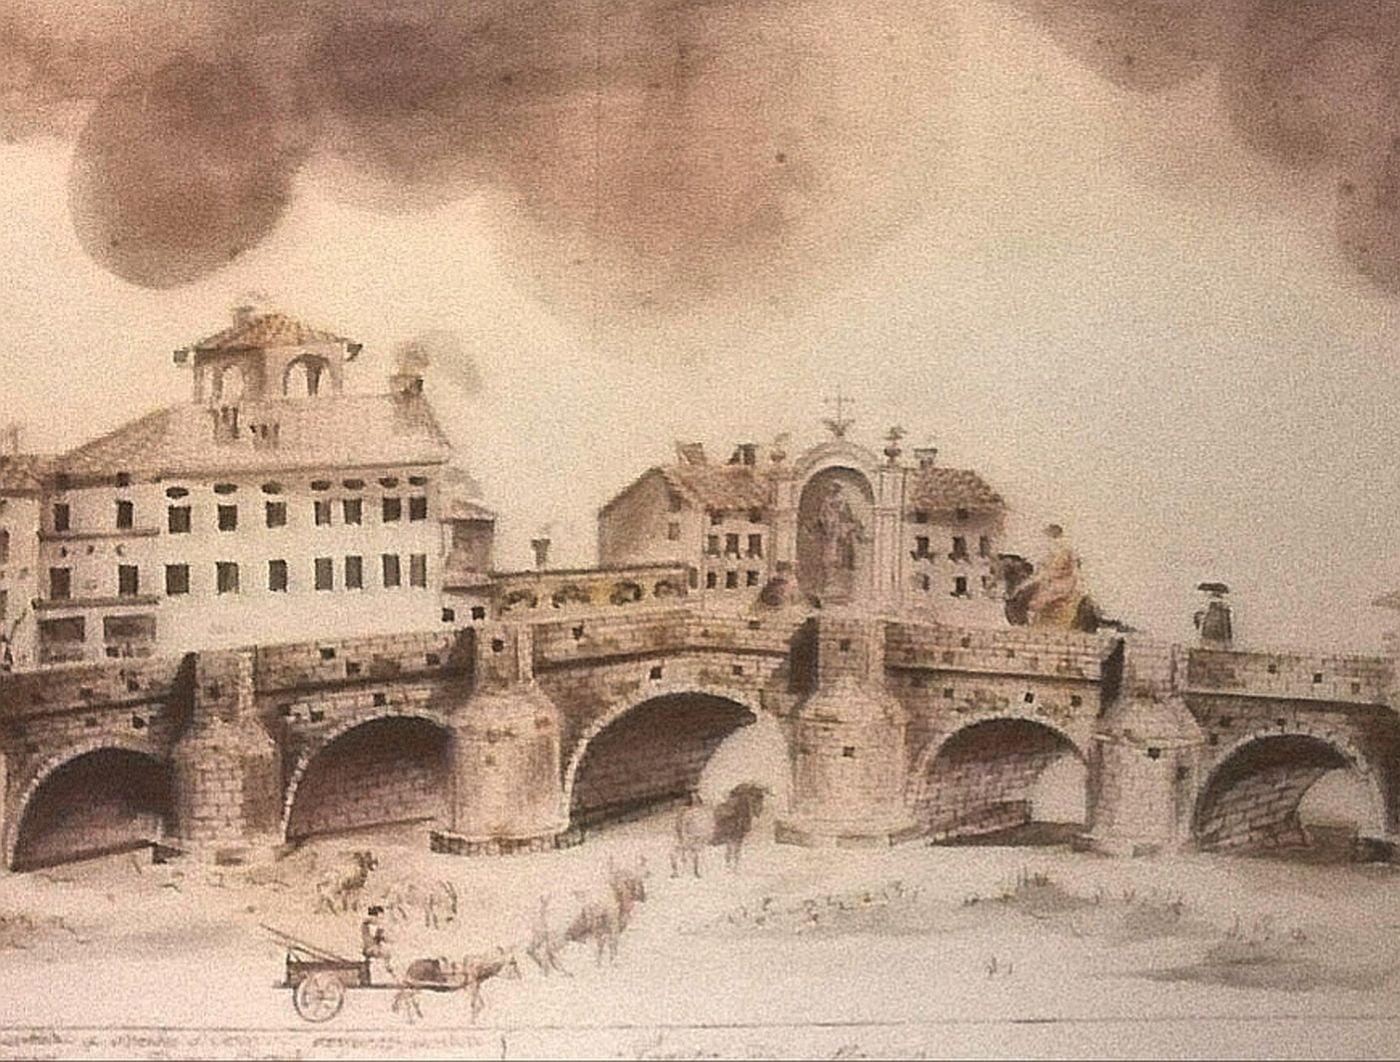 Reconstruction of the Roman bridge in Parma